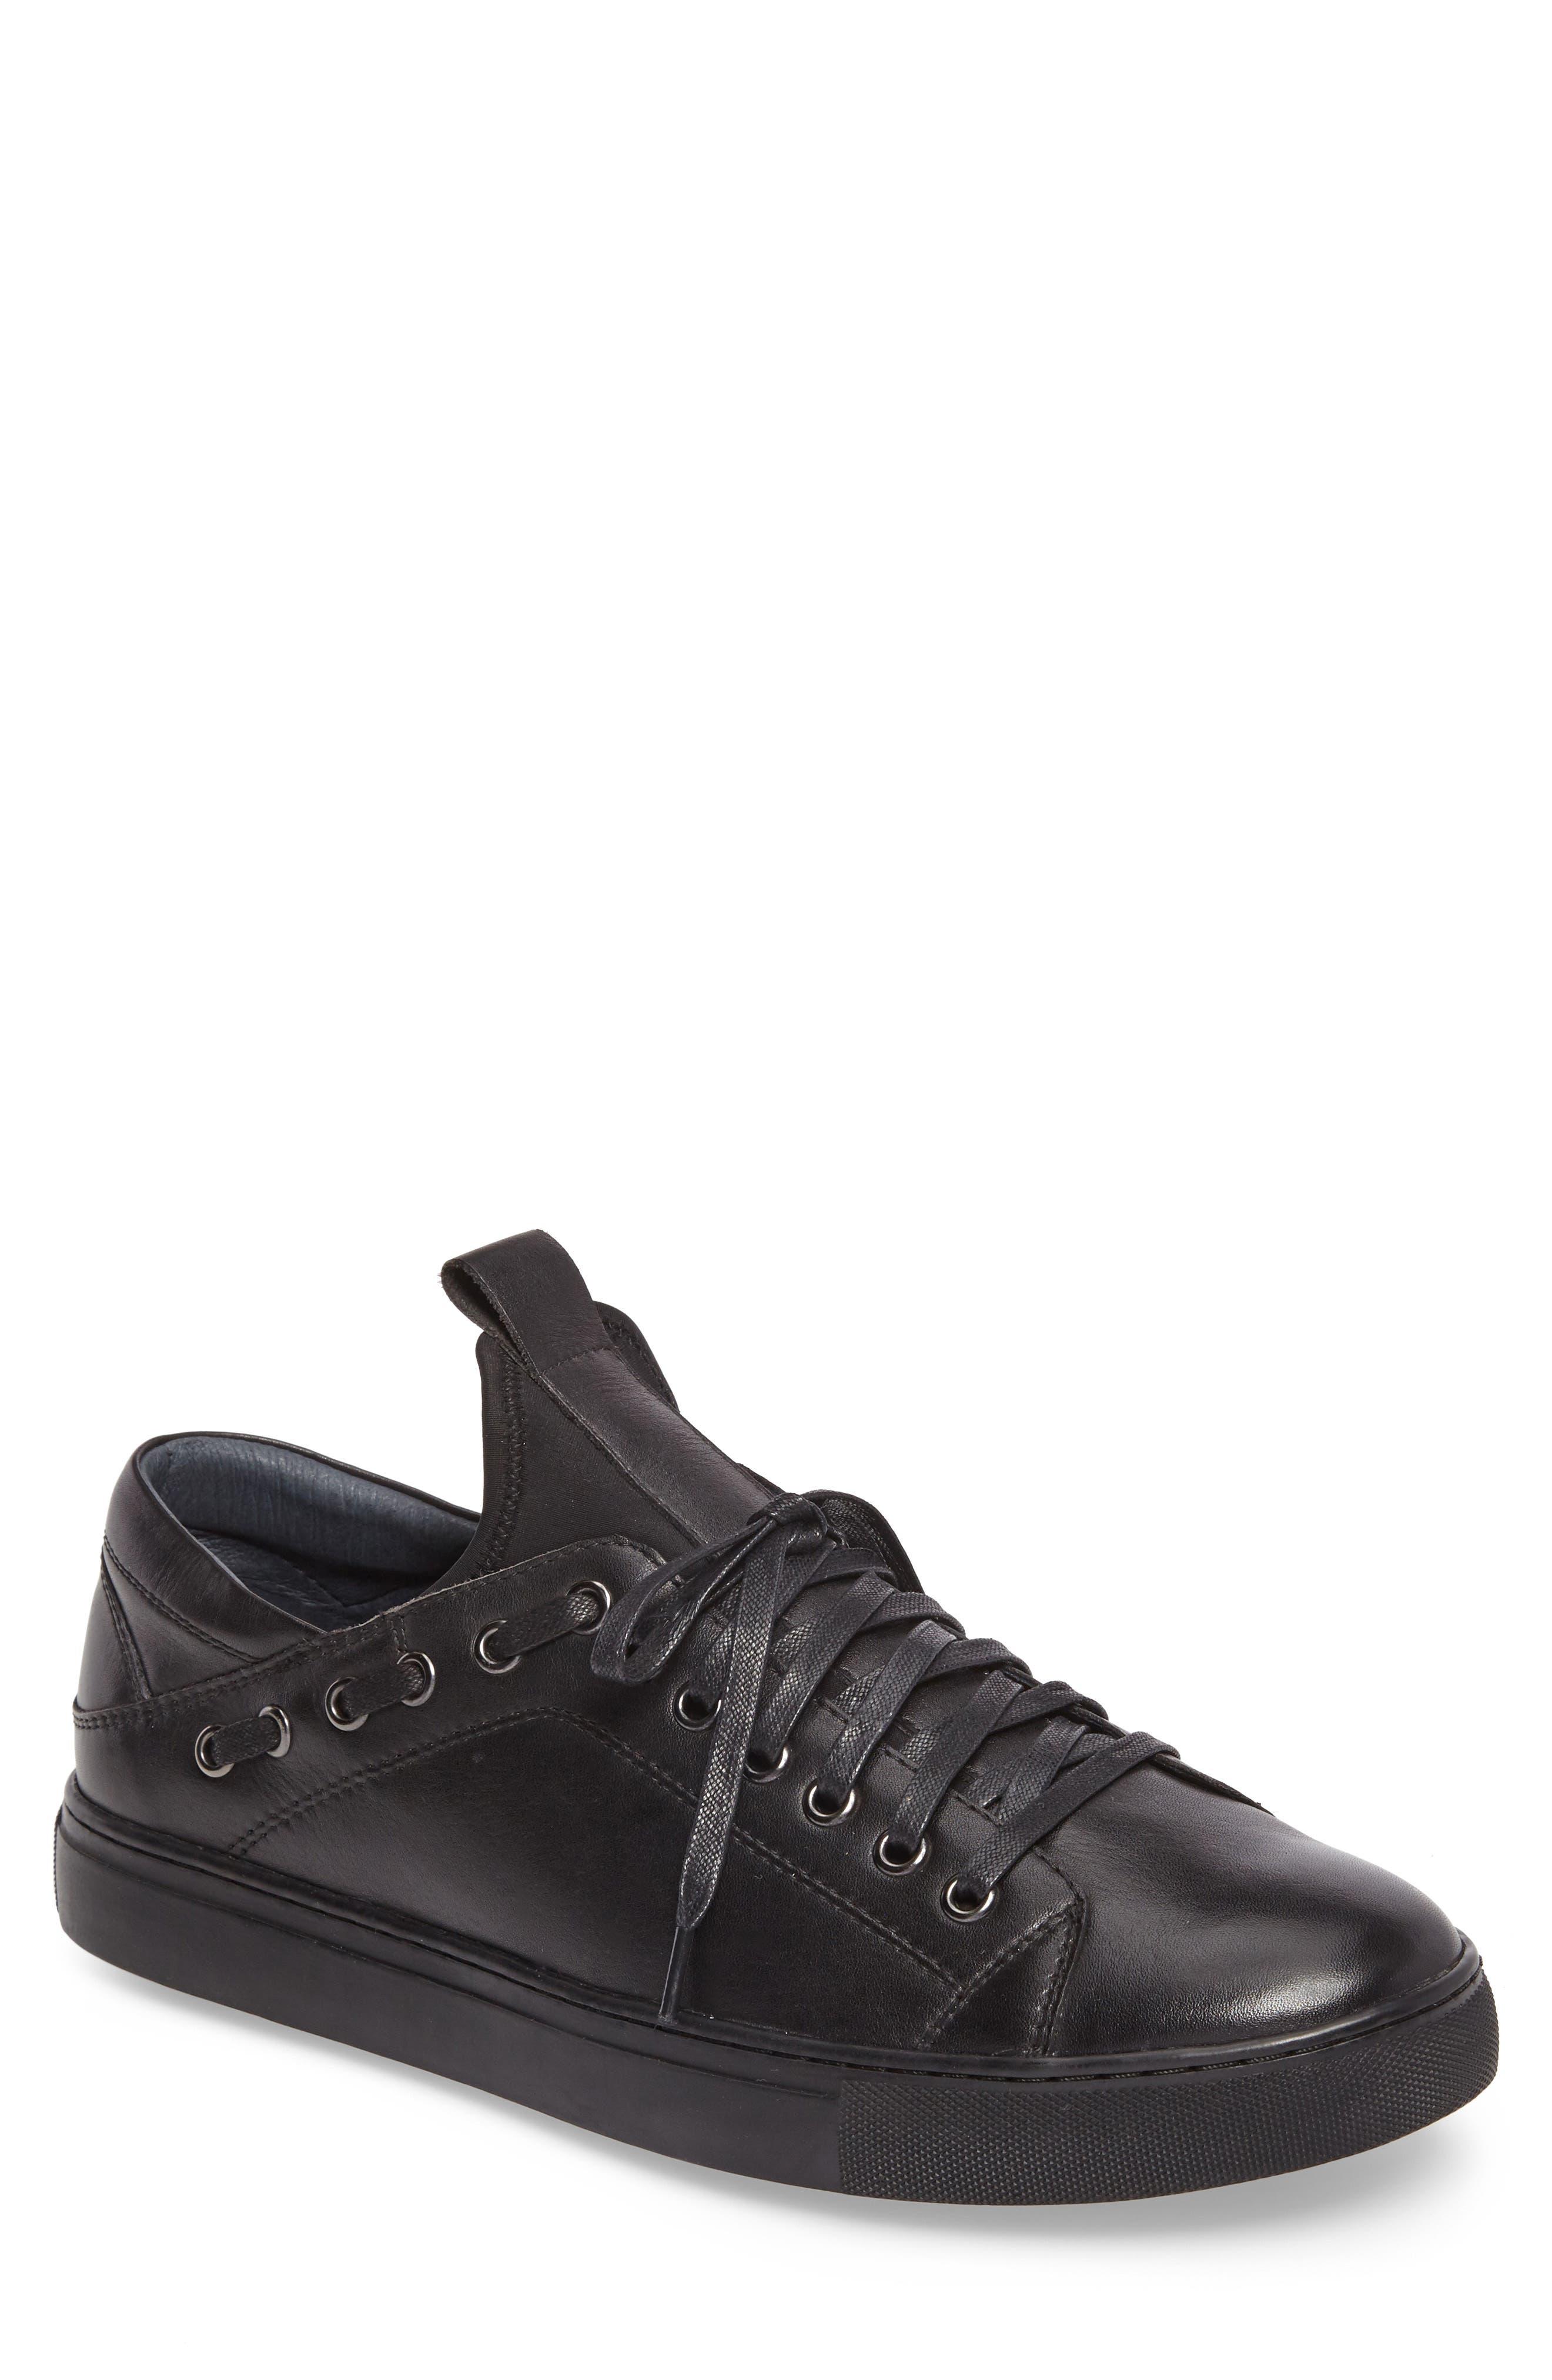 Owen Sneaker,                             Main thumbnail 1, color,